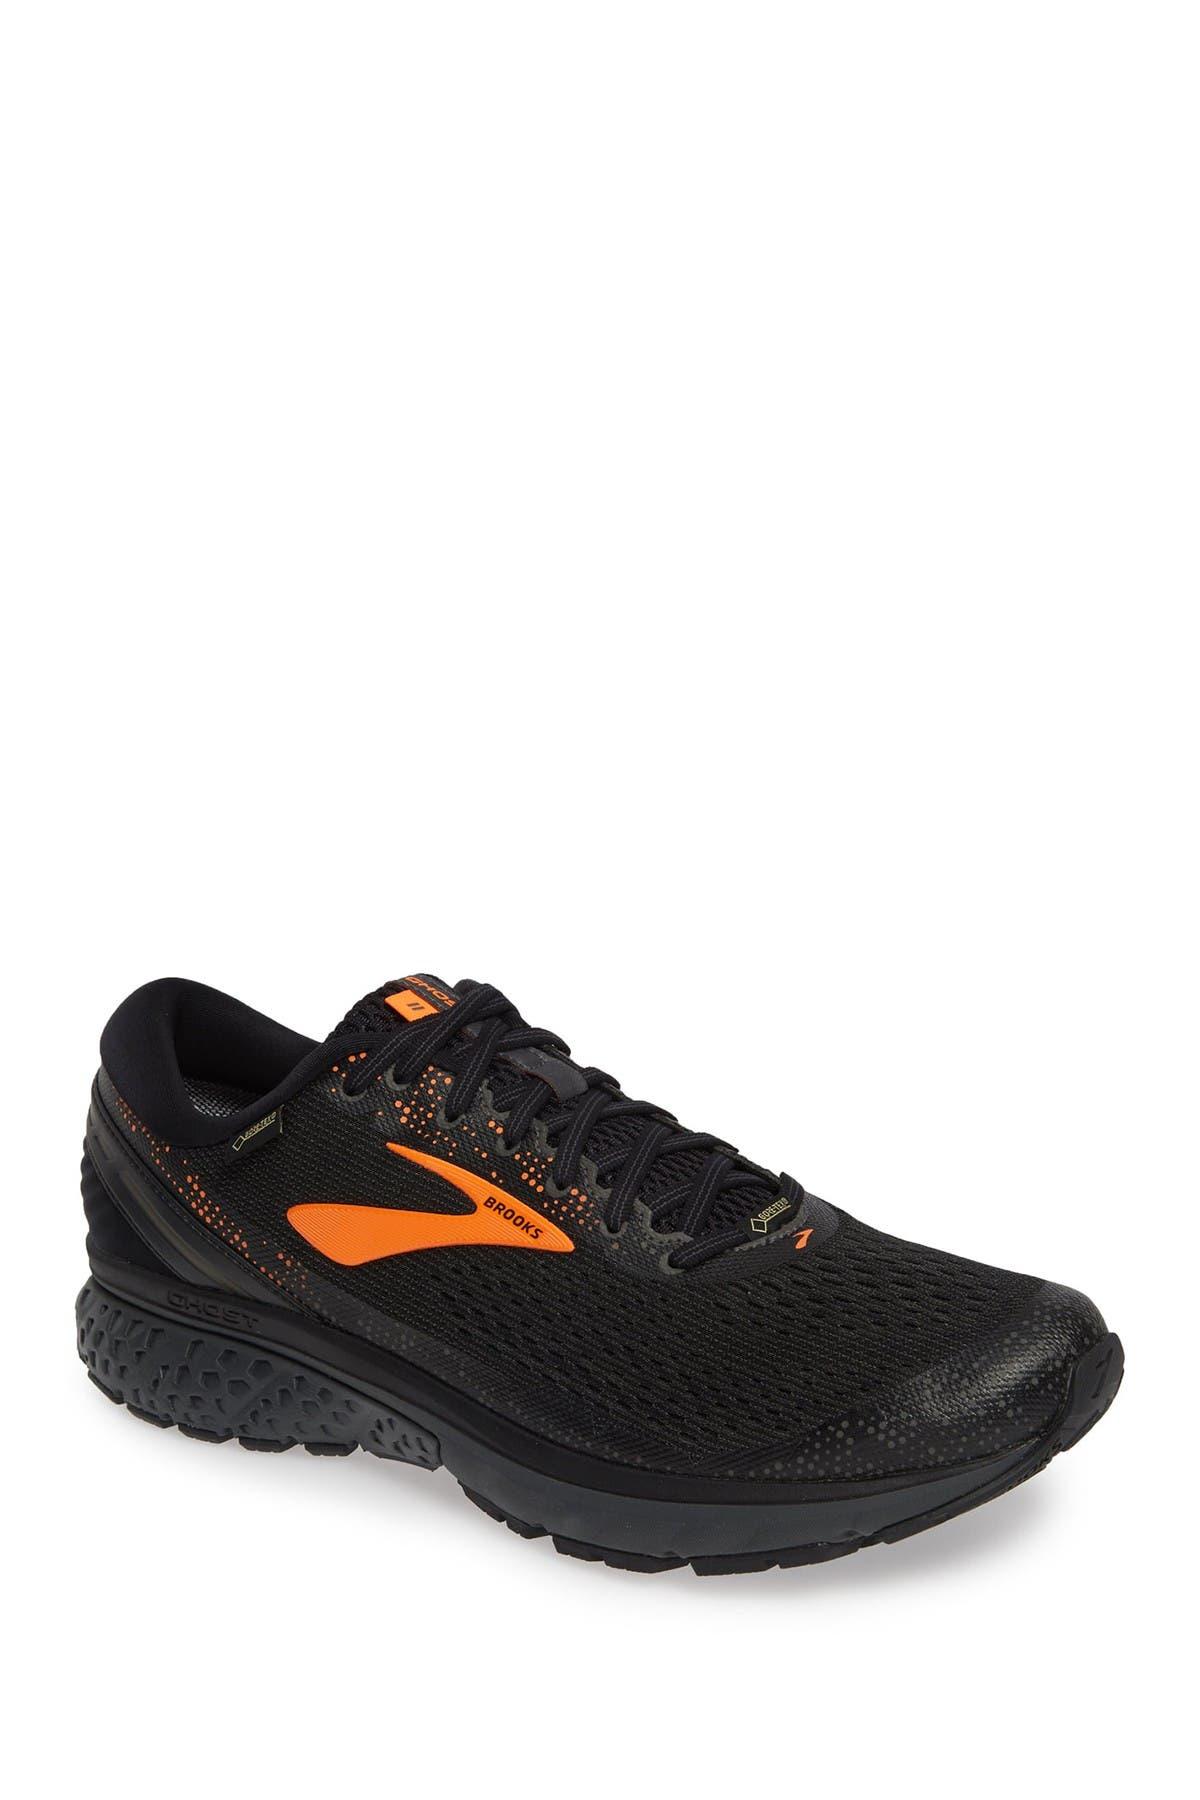 Brooks | Ghost 11 GTX Running Shoe